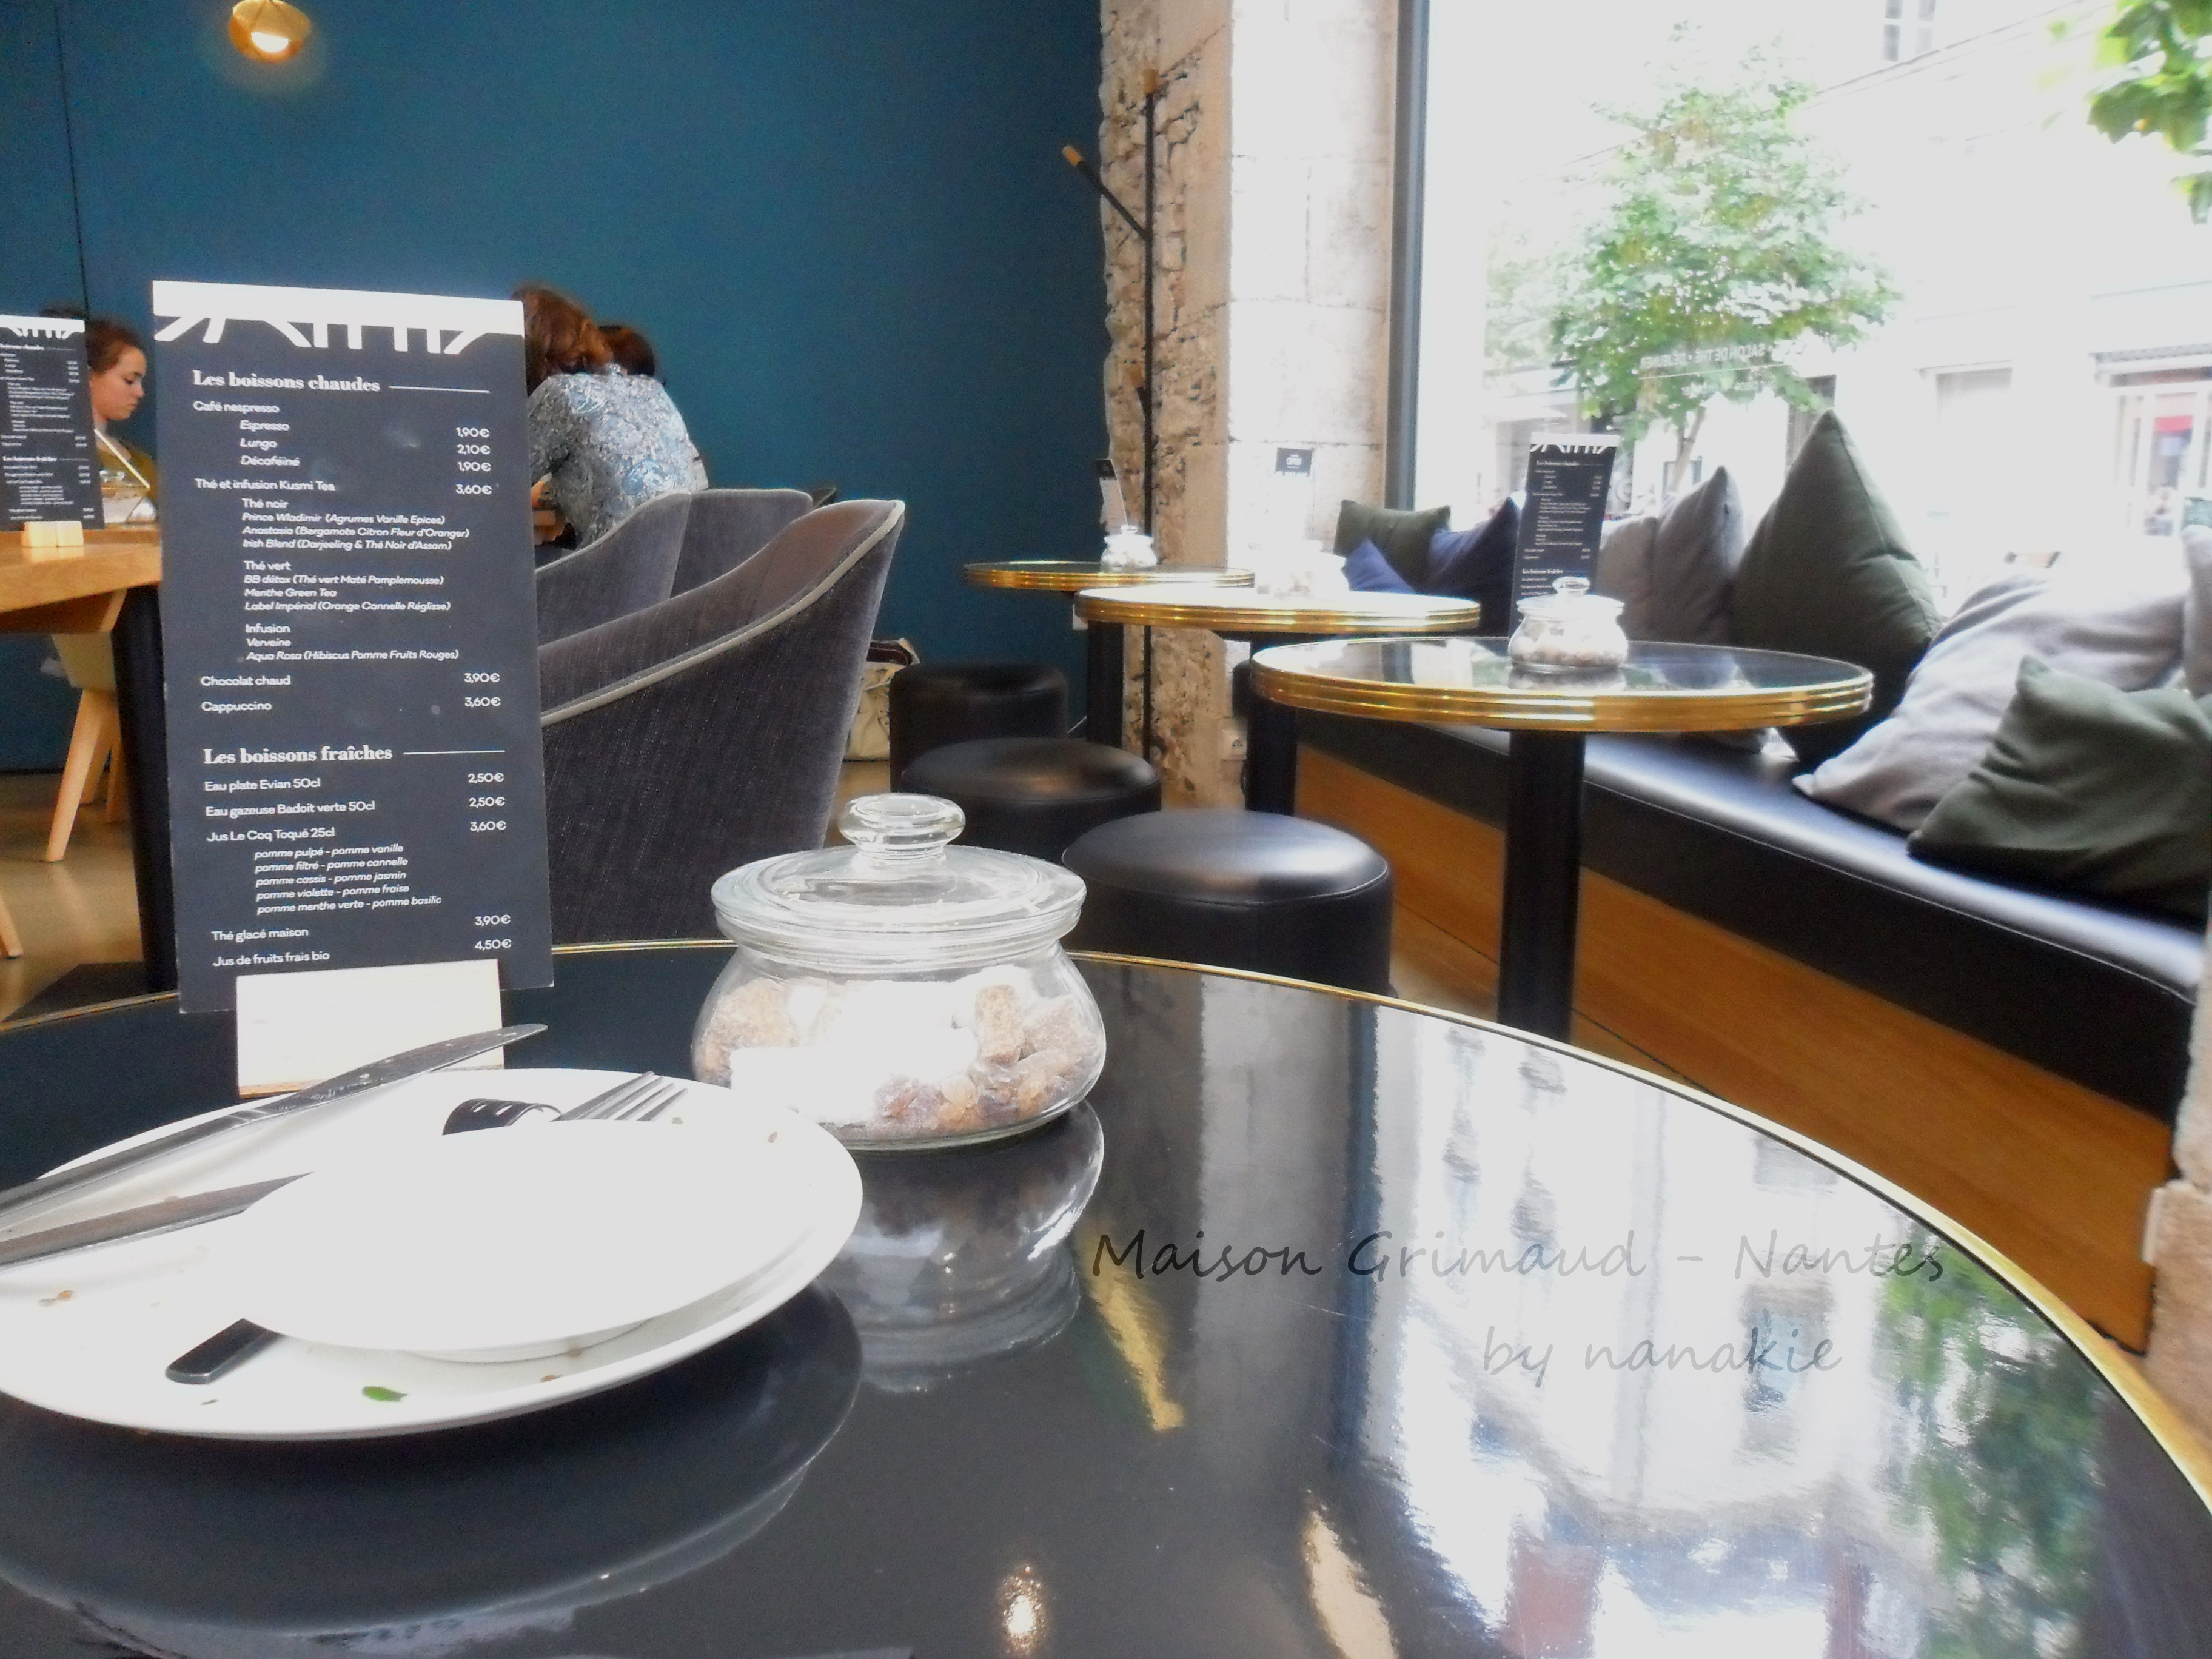 maison grimaud location maison with maison grimaud cool. Black Bedroom Furniture Sets. Home Design Ideas